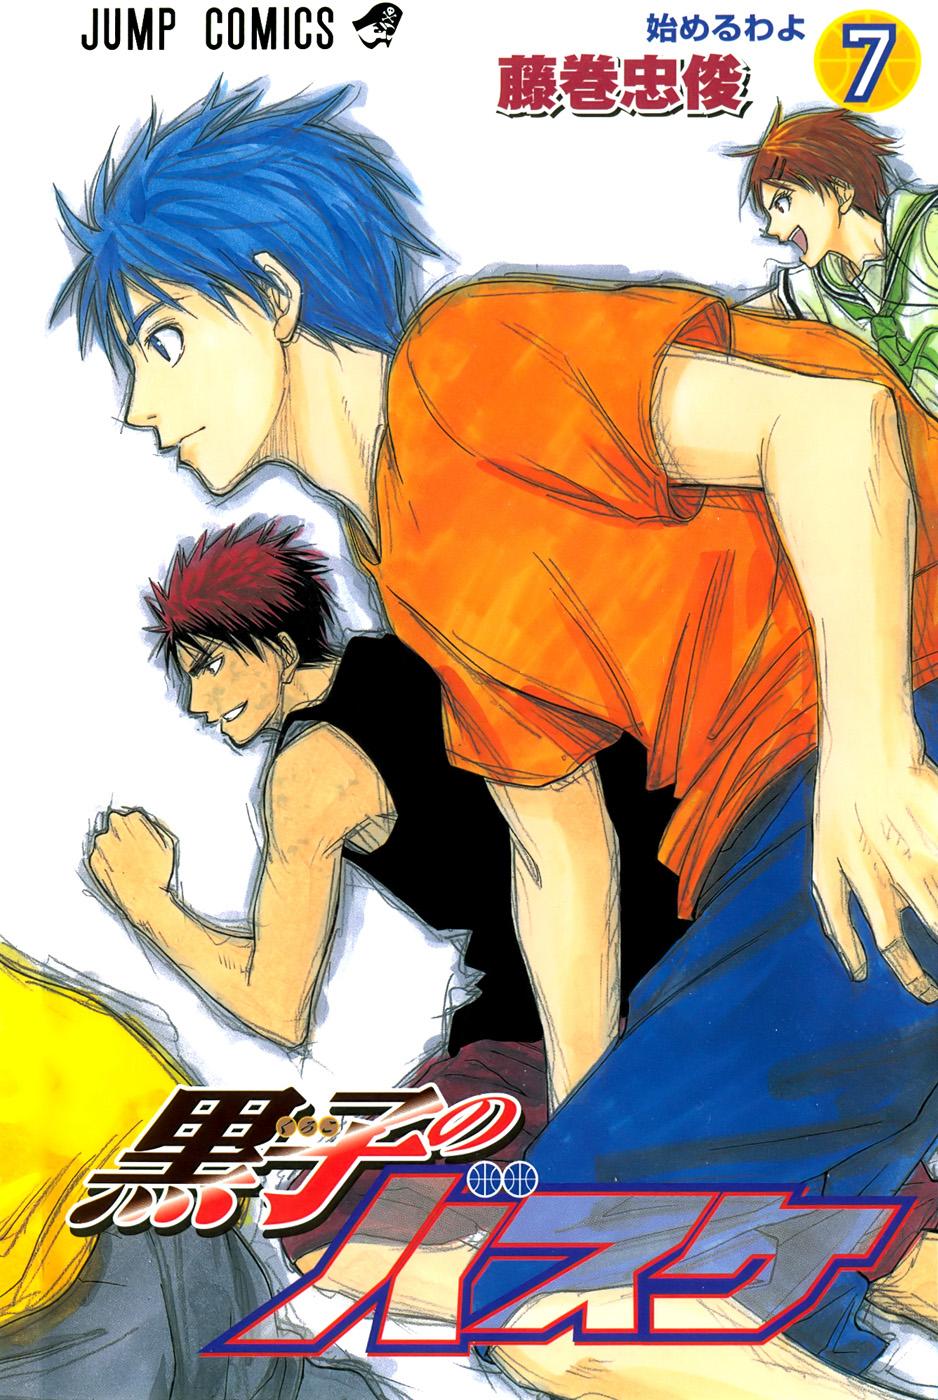 Kuroko no Basket Manga Chapter 53 - Image 0/002